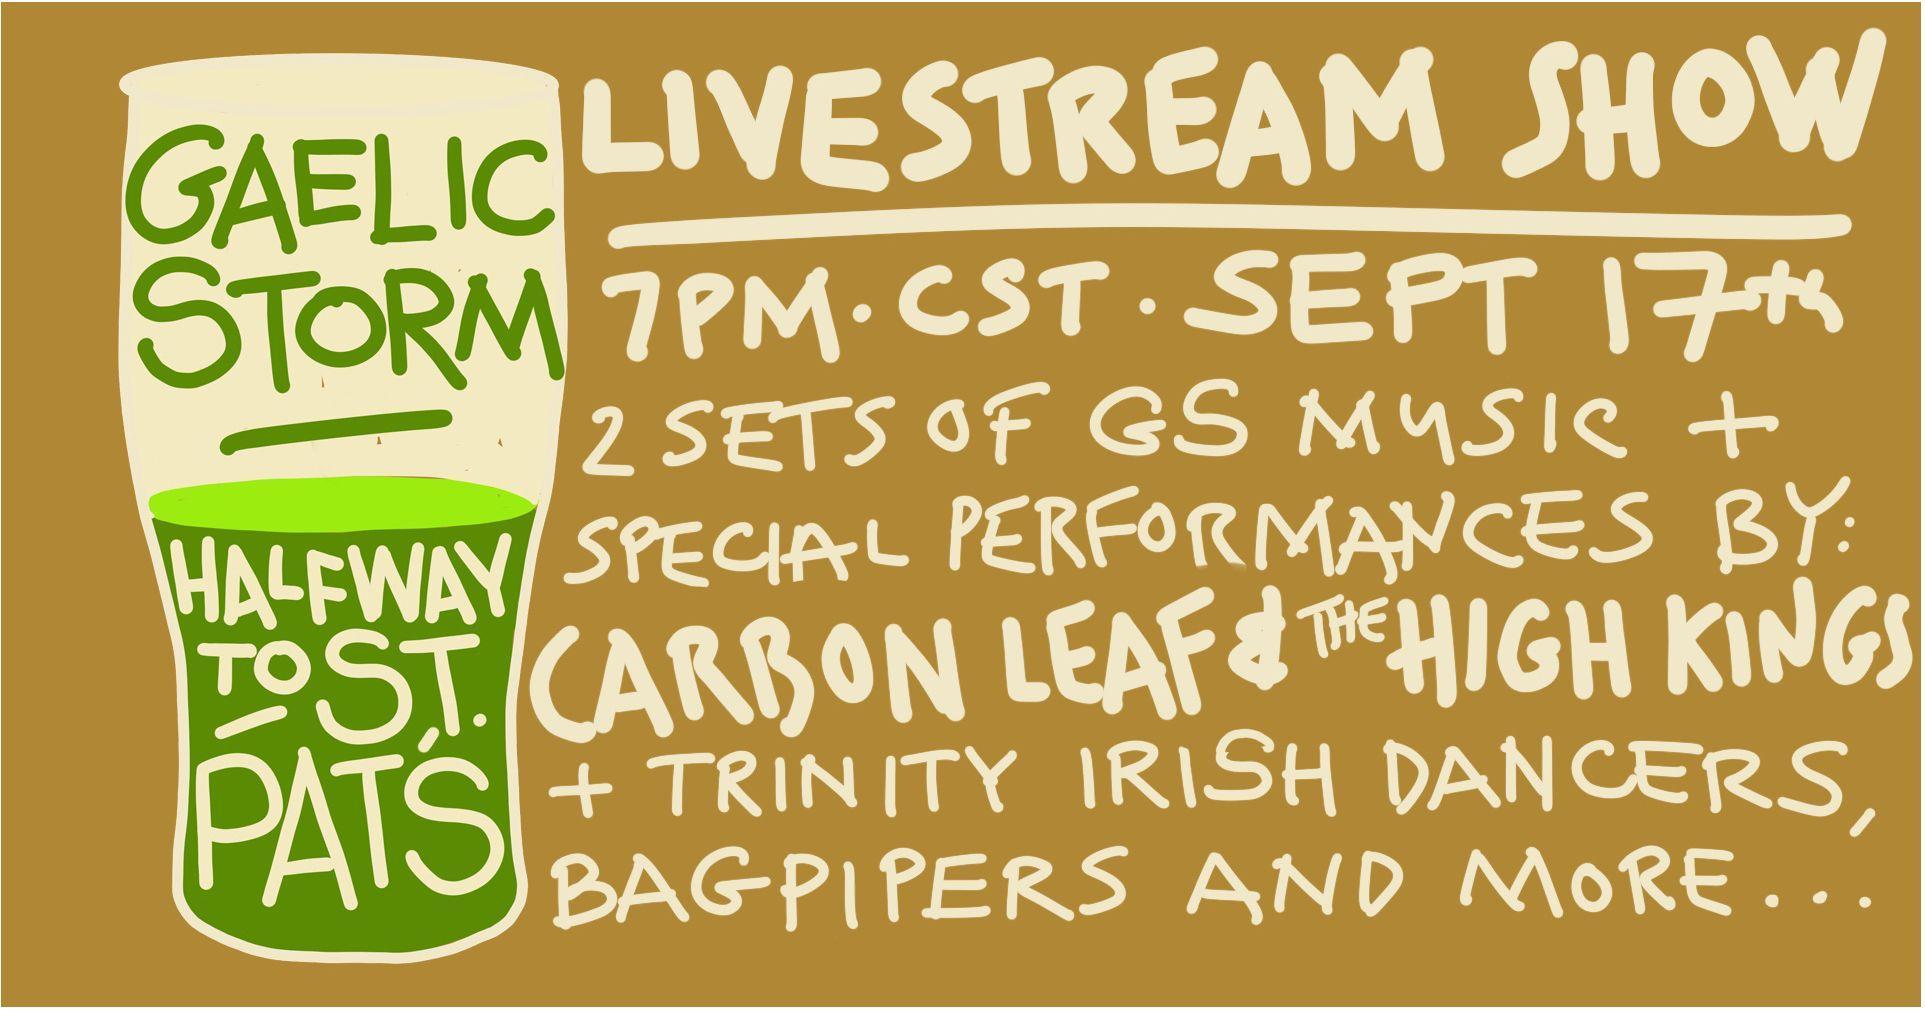 Gaelic Storm Live Stream